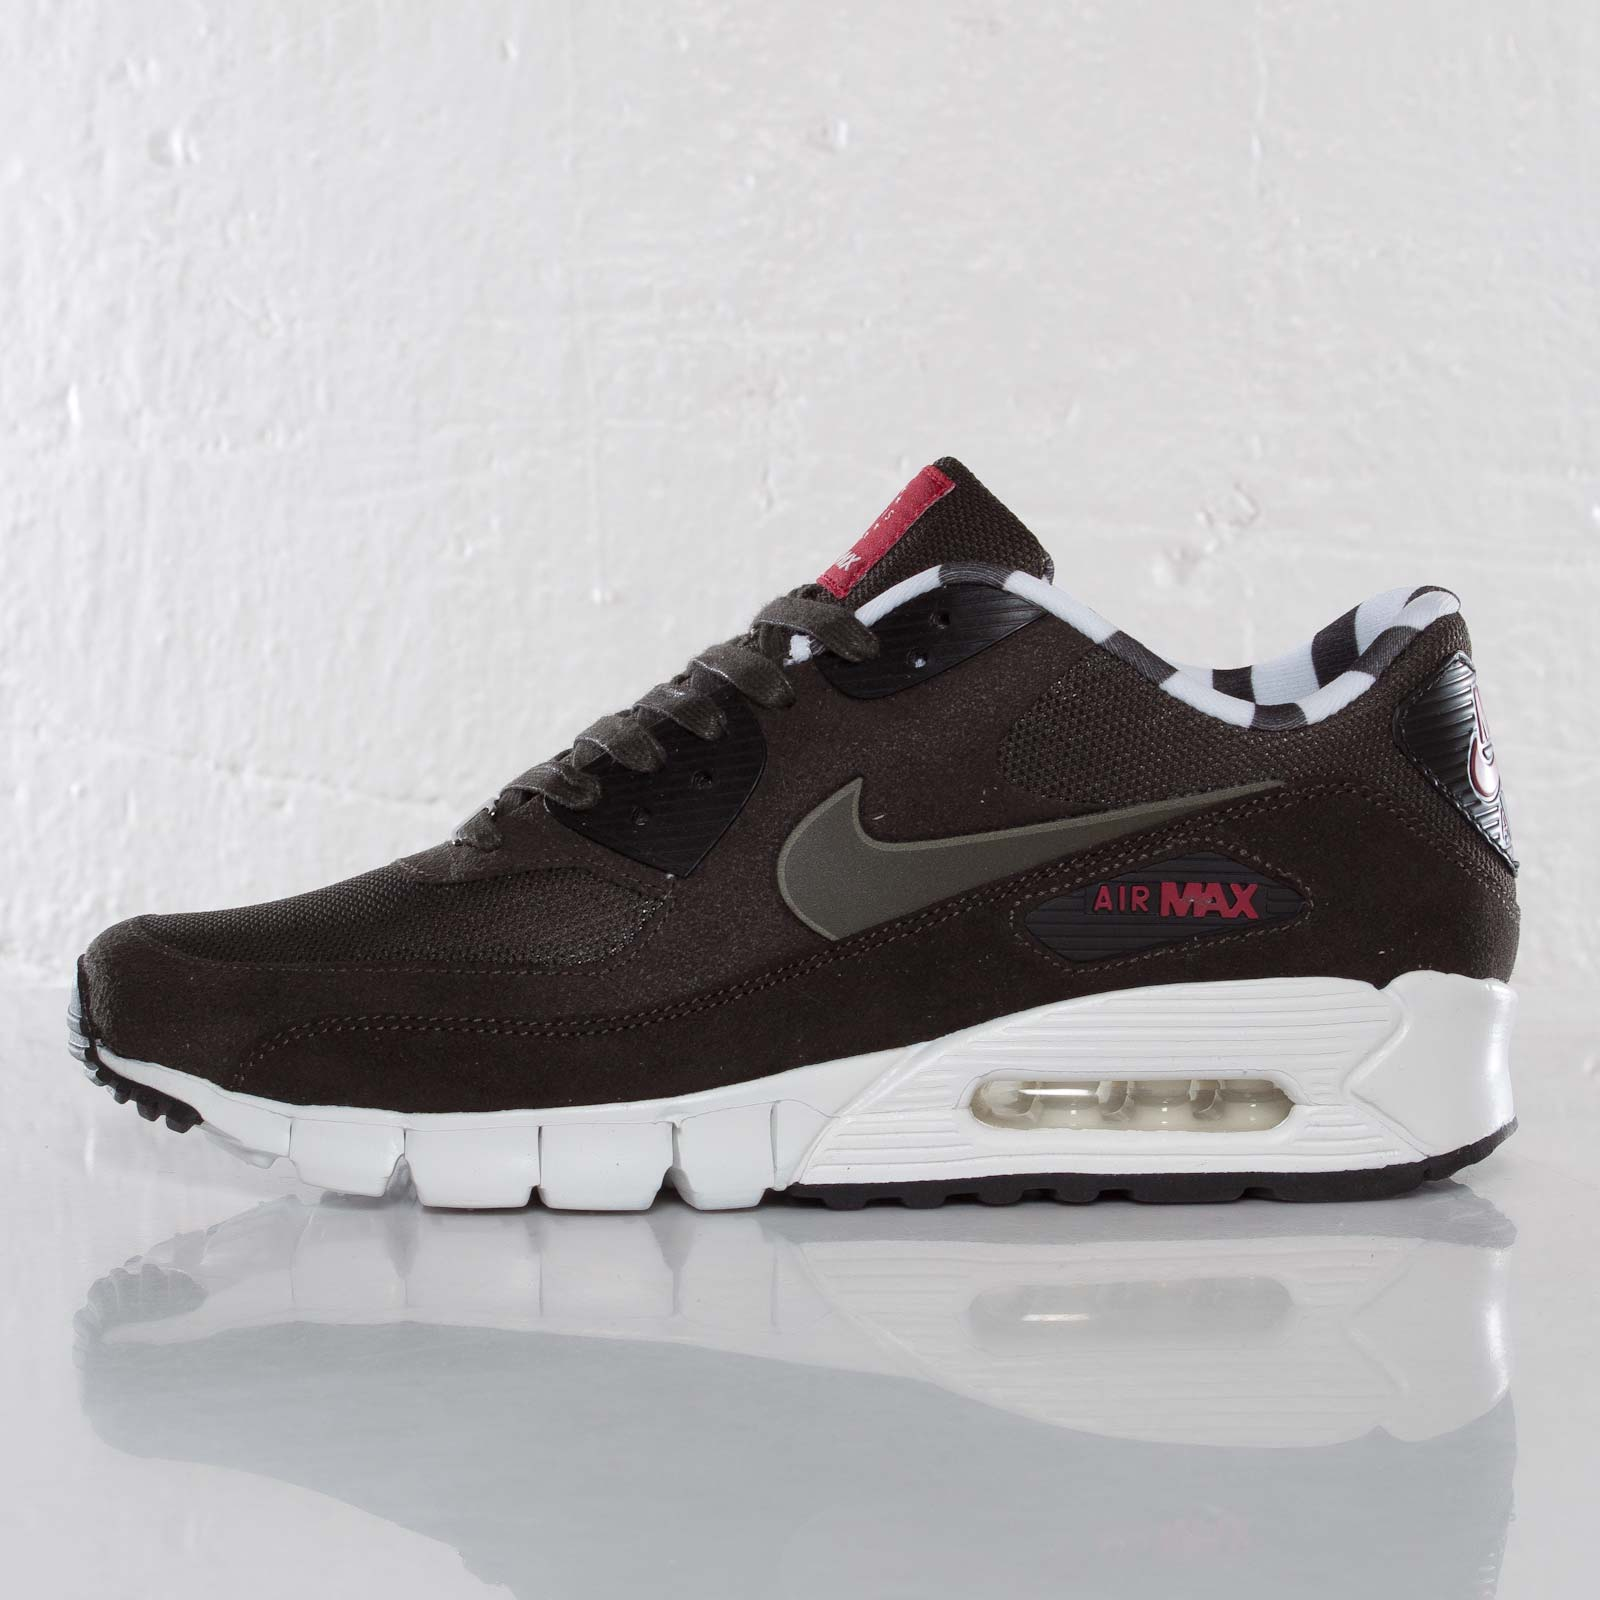 new list cute cheap factory outlet Nike Air Max 90 Paris QS - 587581-226 - Sneakersnstuff   sneakers ...